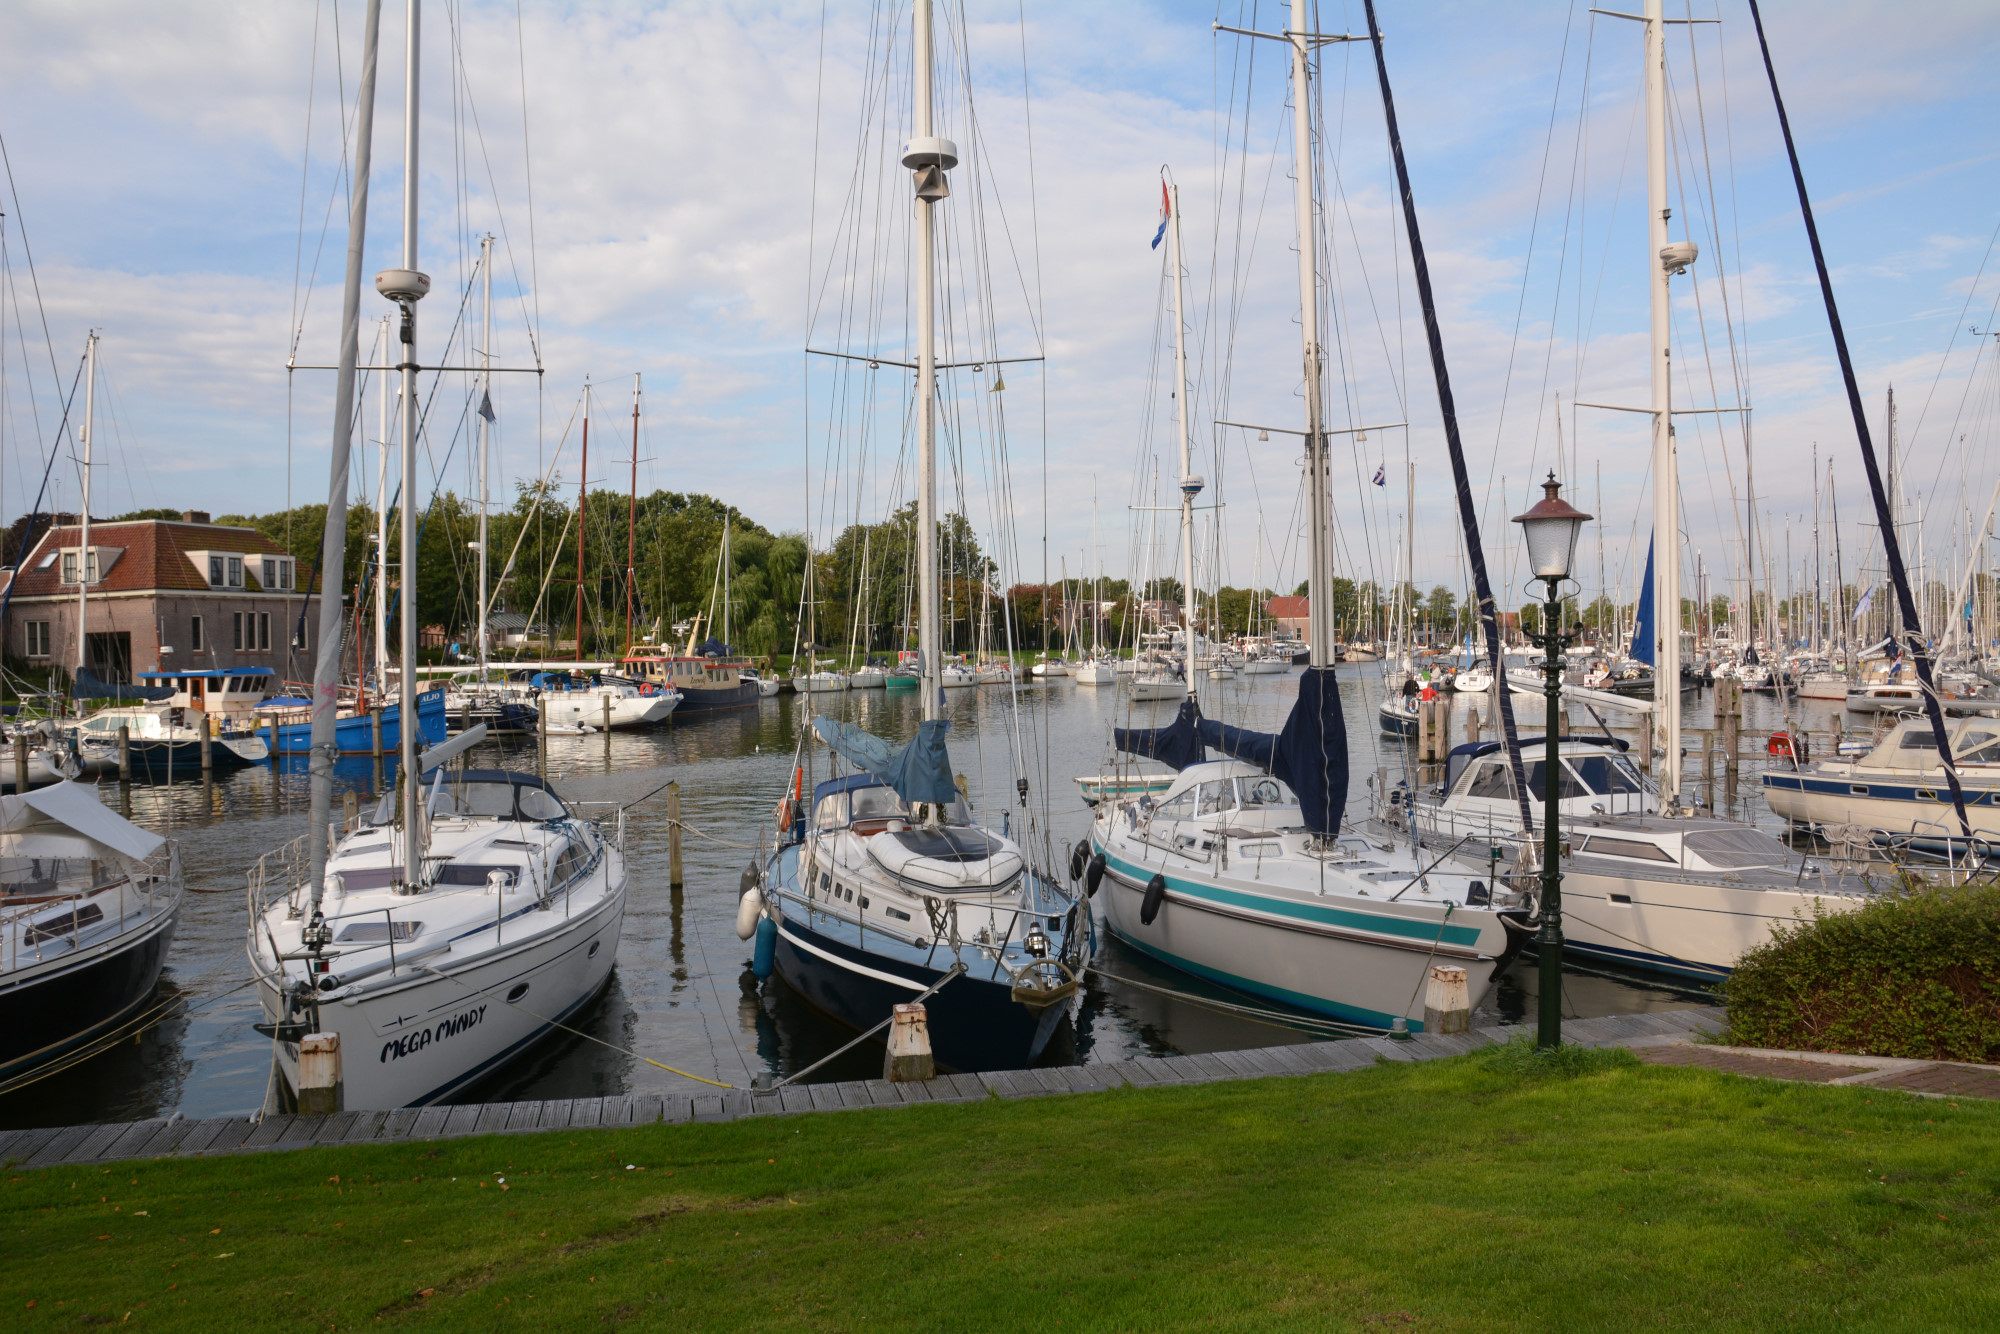 Stichting Jachthaven Medemblik – Westerhaven